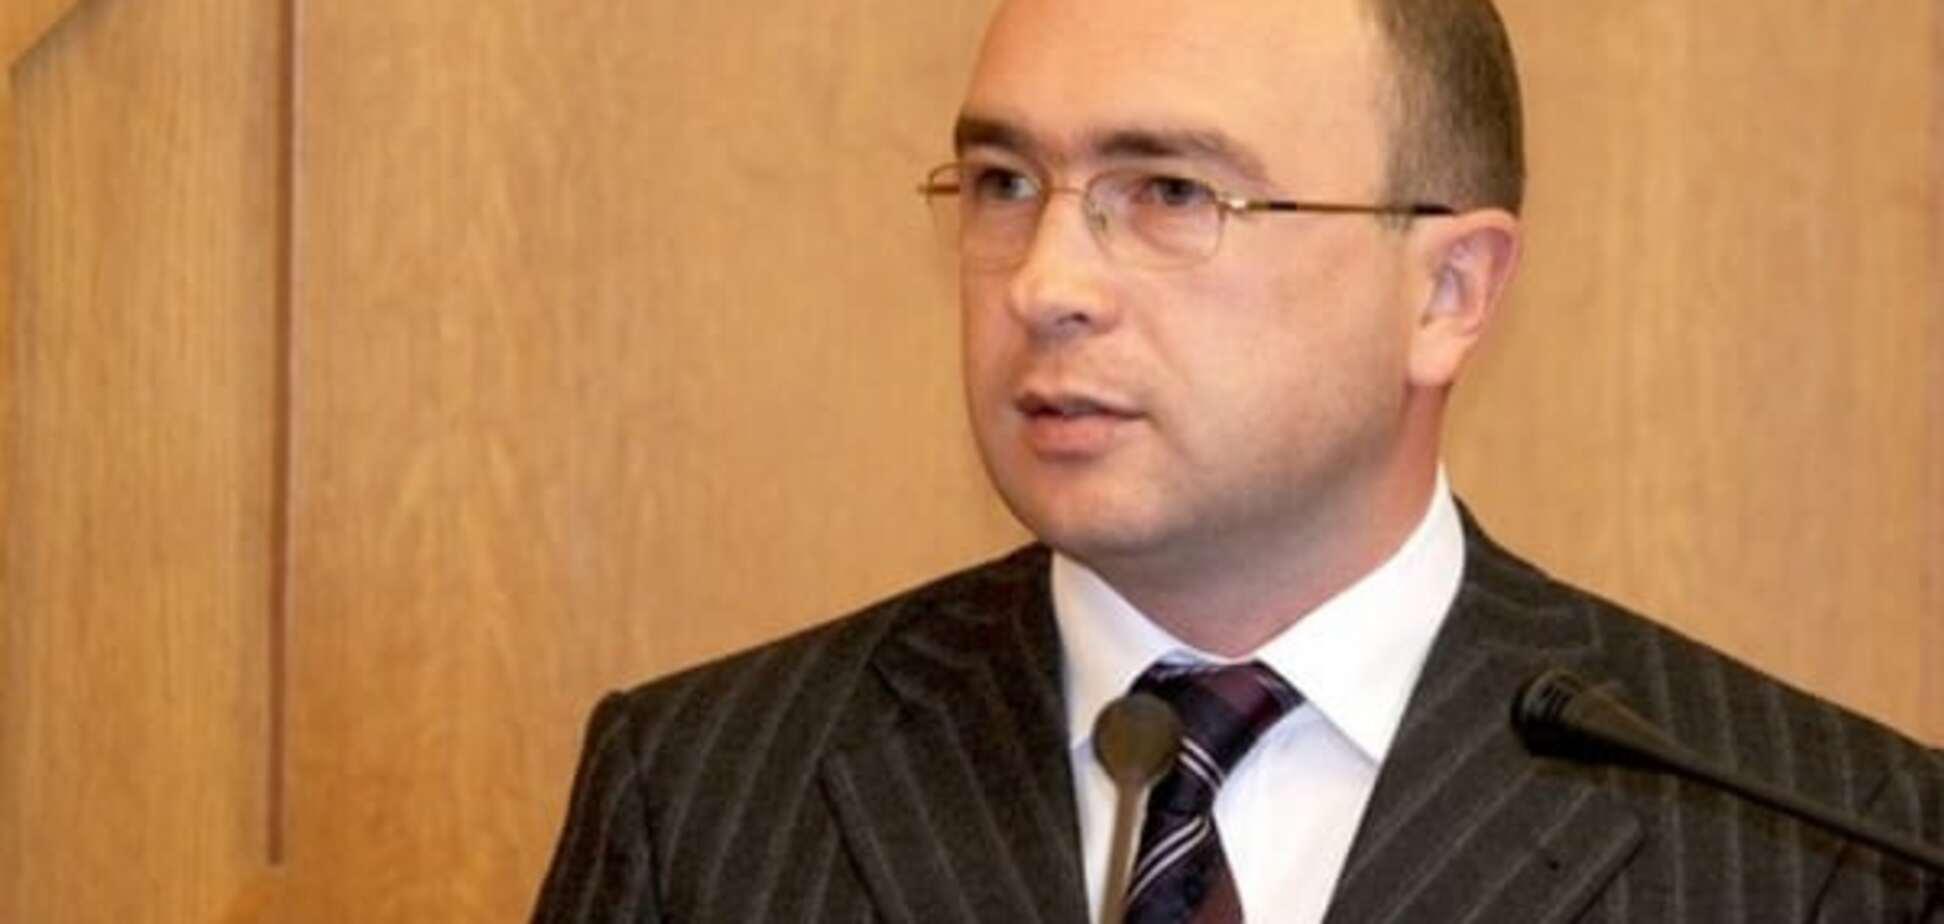 Экс-министр туризма Крыма: блокада льет воду на мельницу Путина